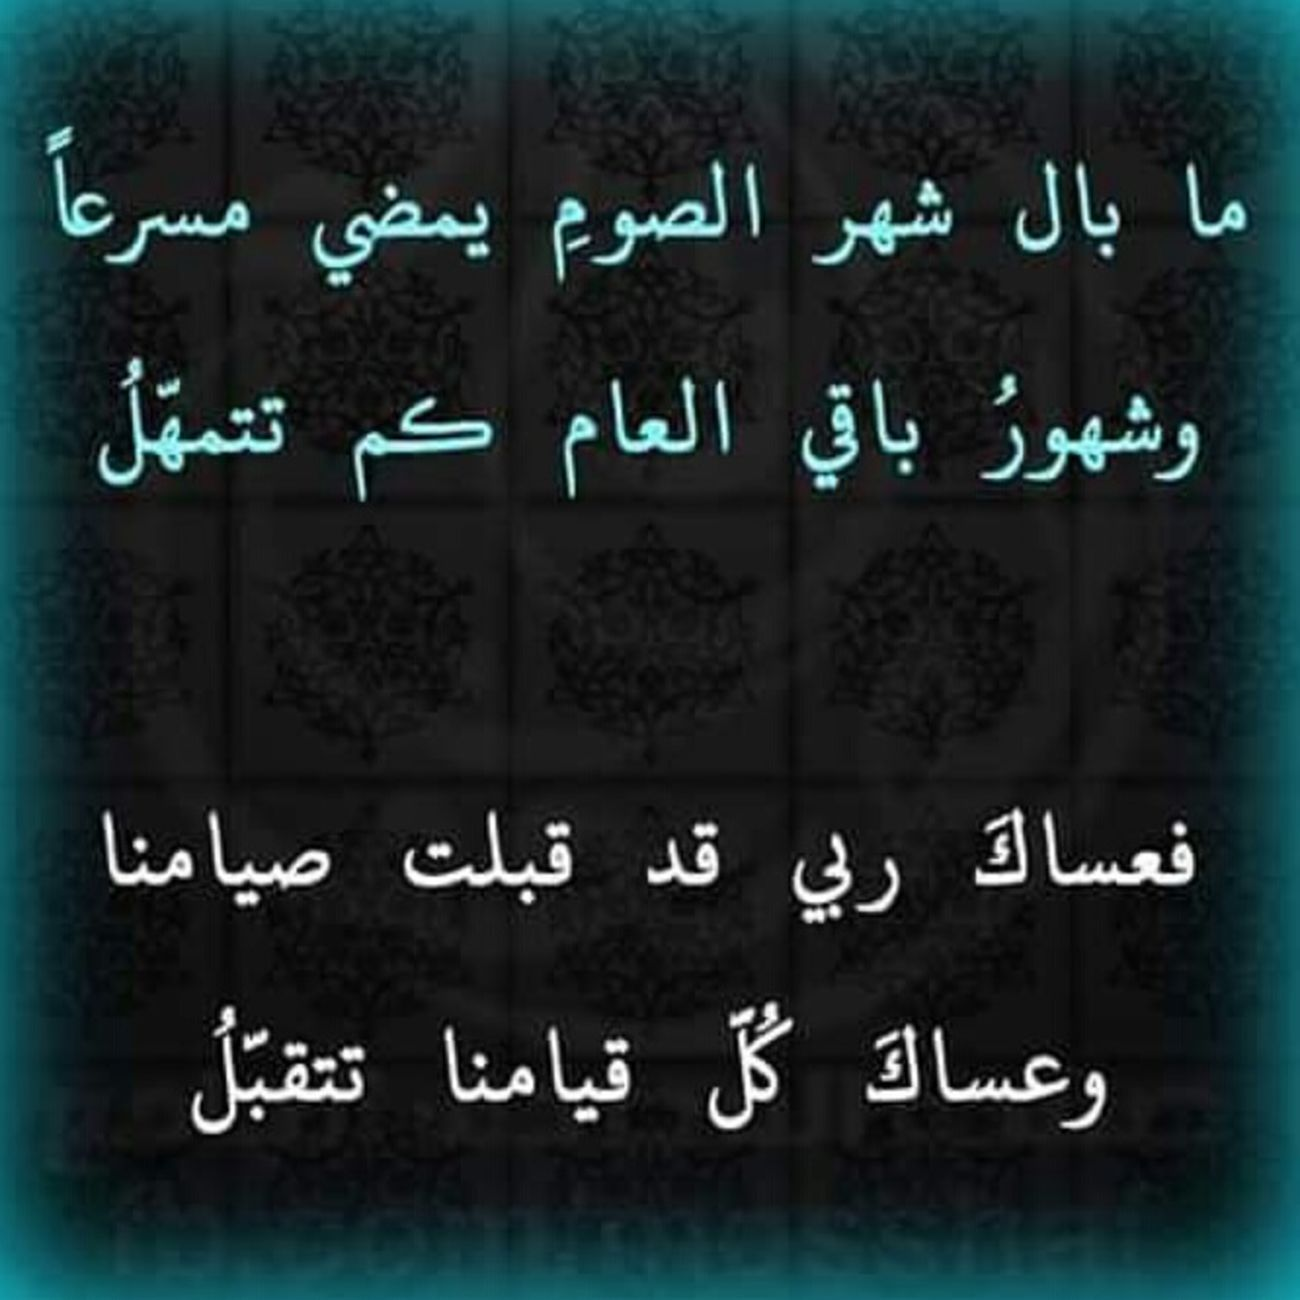 Amen Amen ♥ Amen <3 AMEN!!! Amen! Allah ❤❤ Allah ISLAM♥ Islam Remedhan